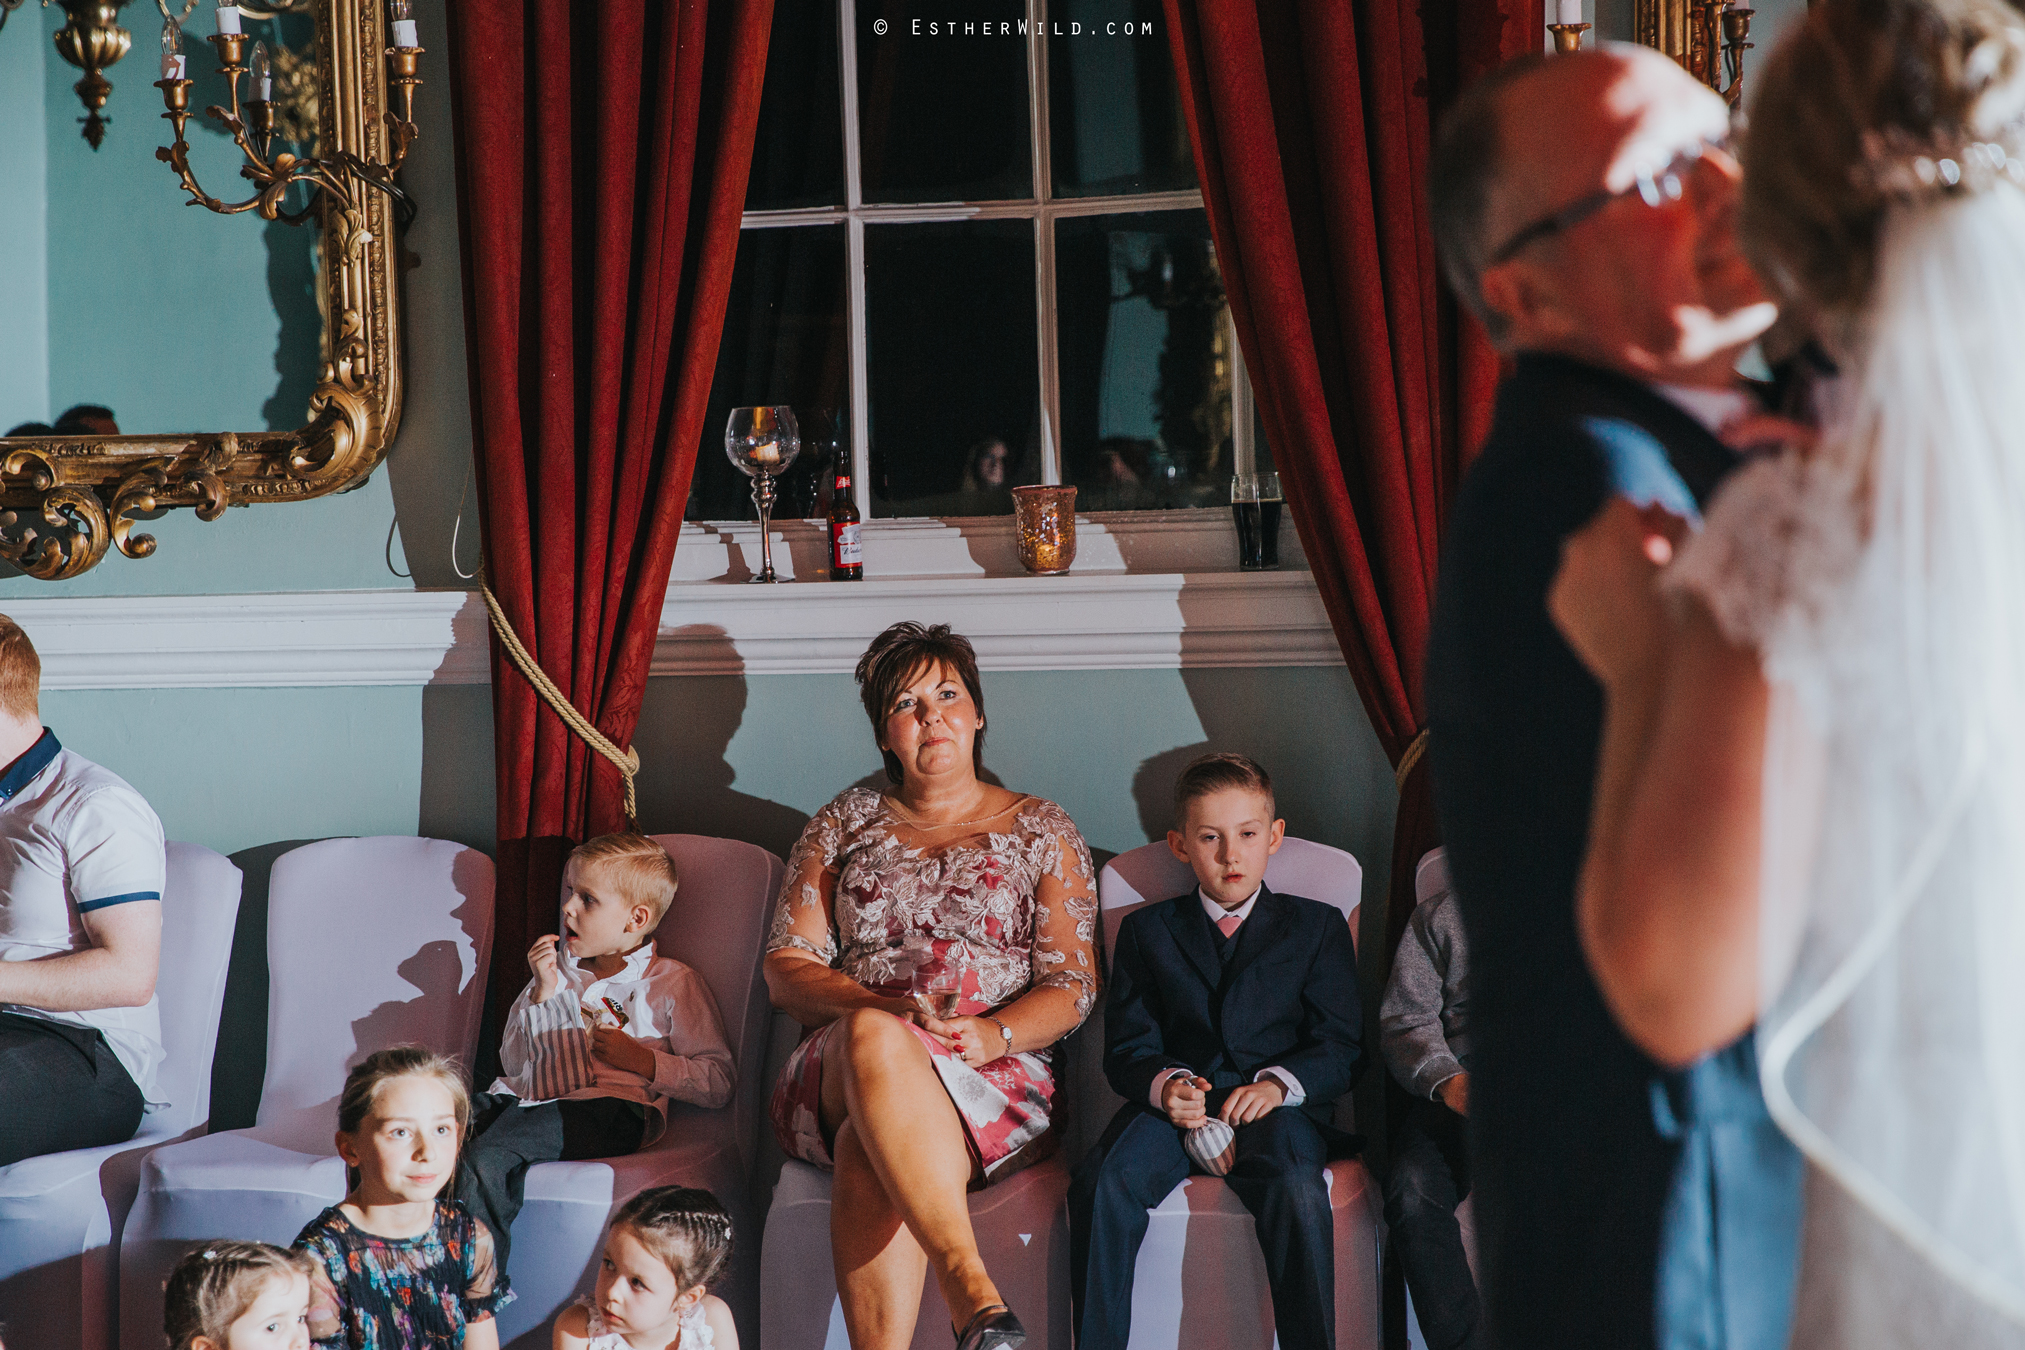 Wedding_Kings_Lynn_Town_Hall_Norfolk_Photographer_Esther_Wild_IMG_1825_IMGL0855.jpg